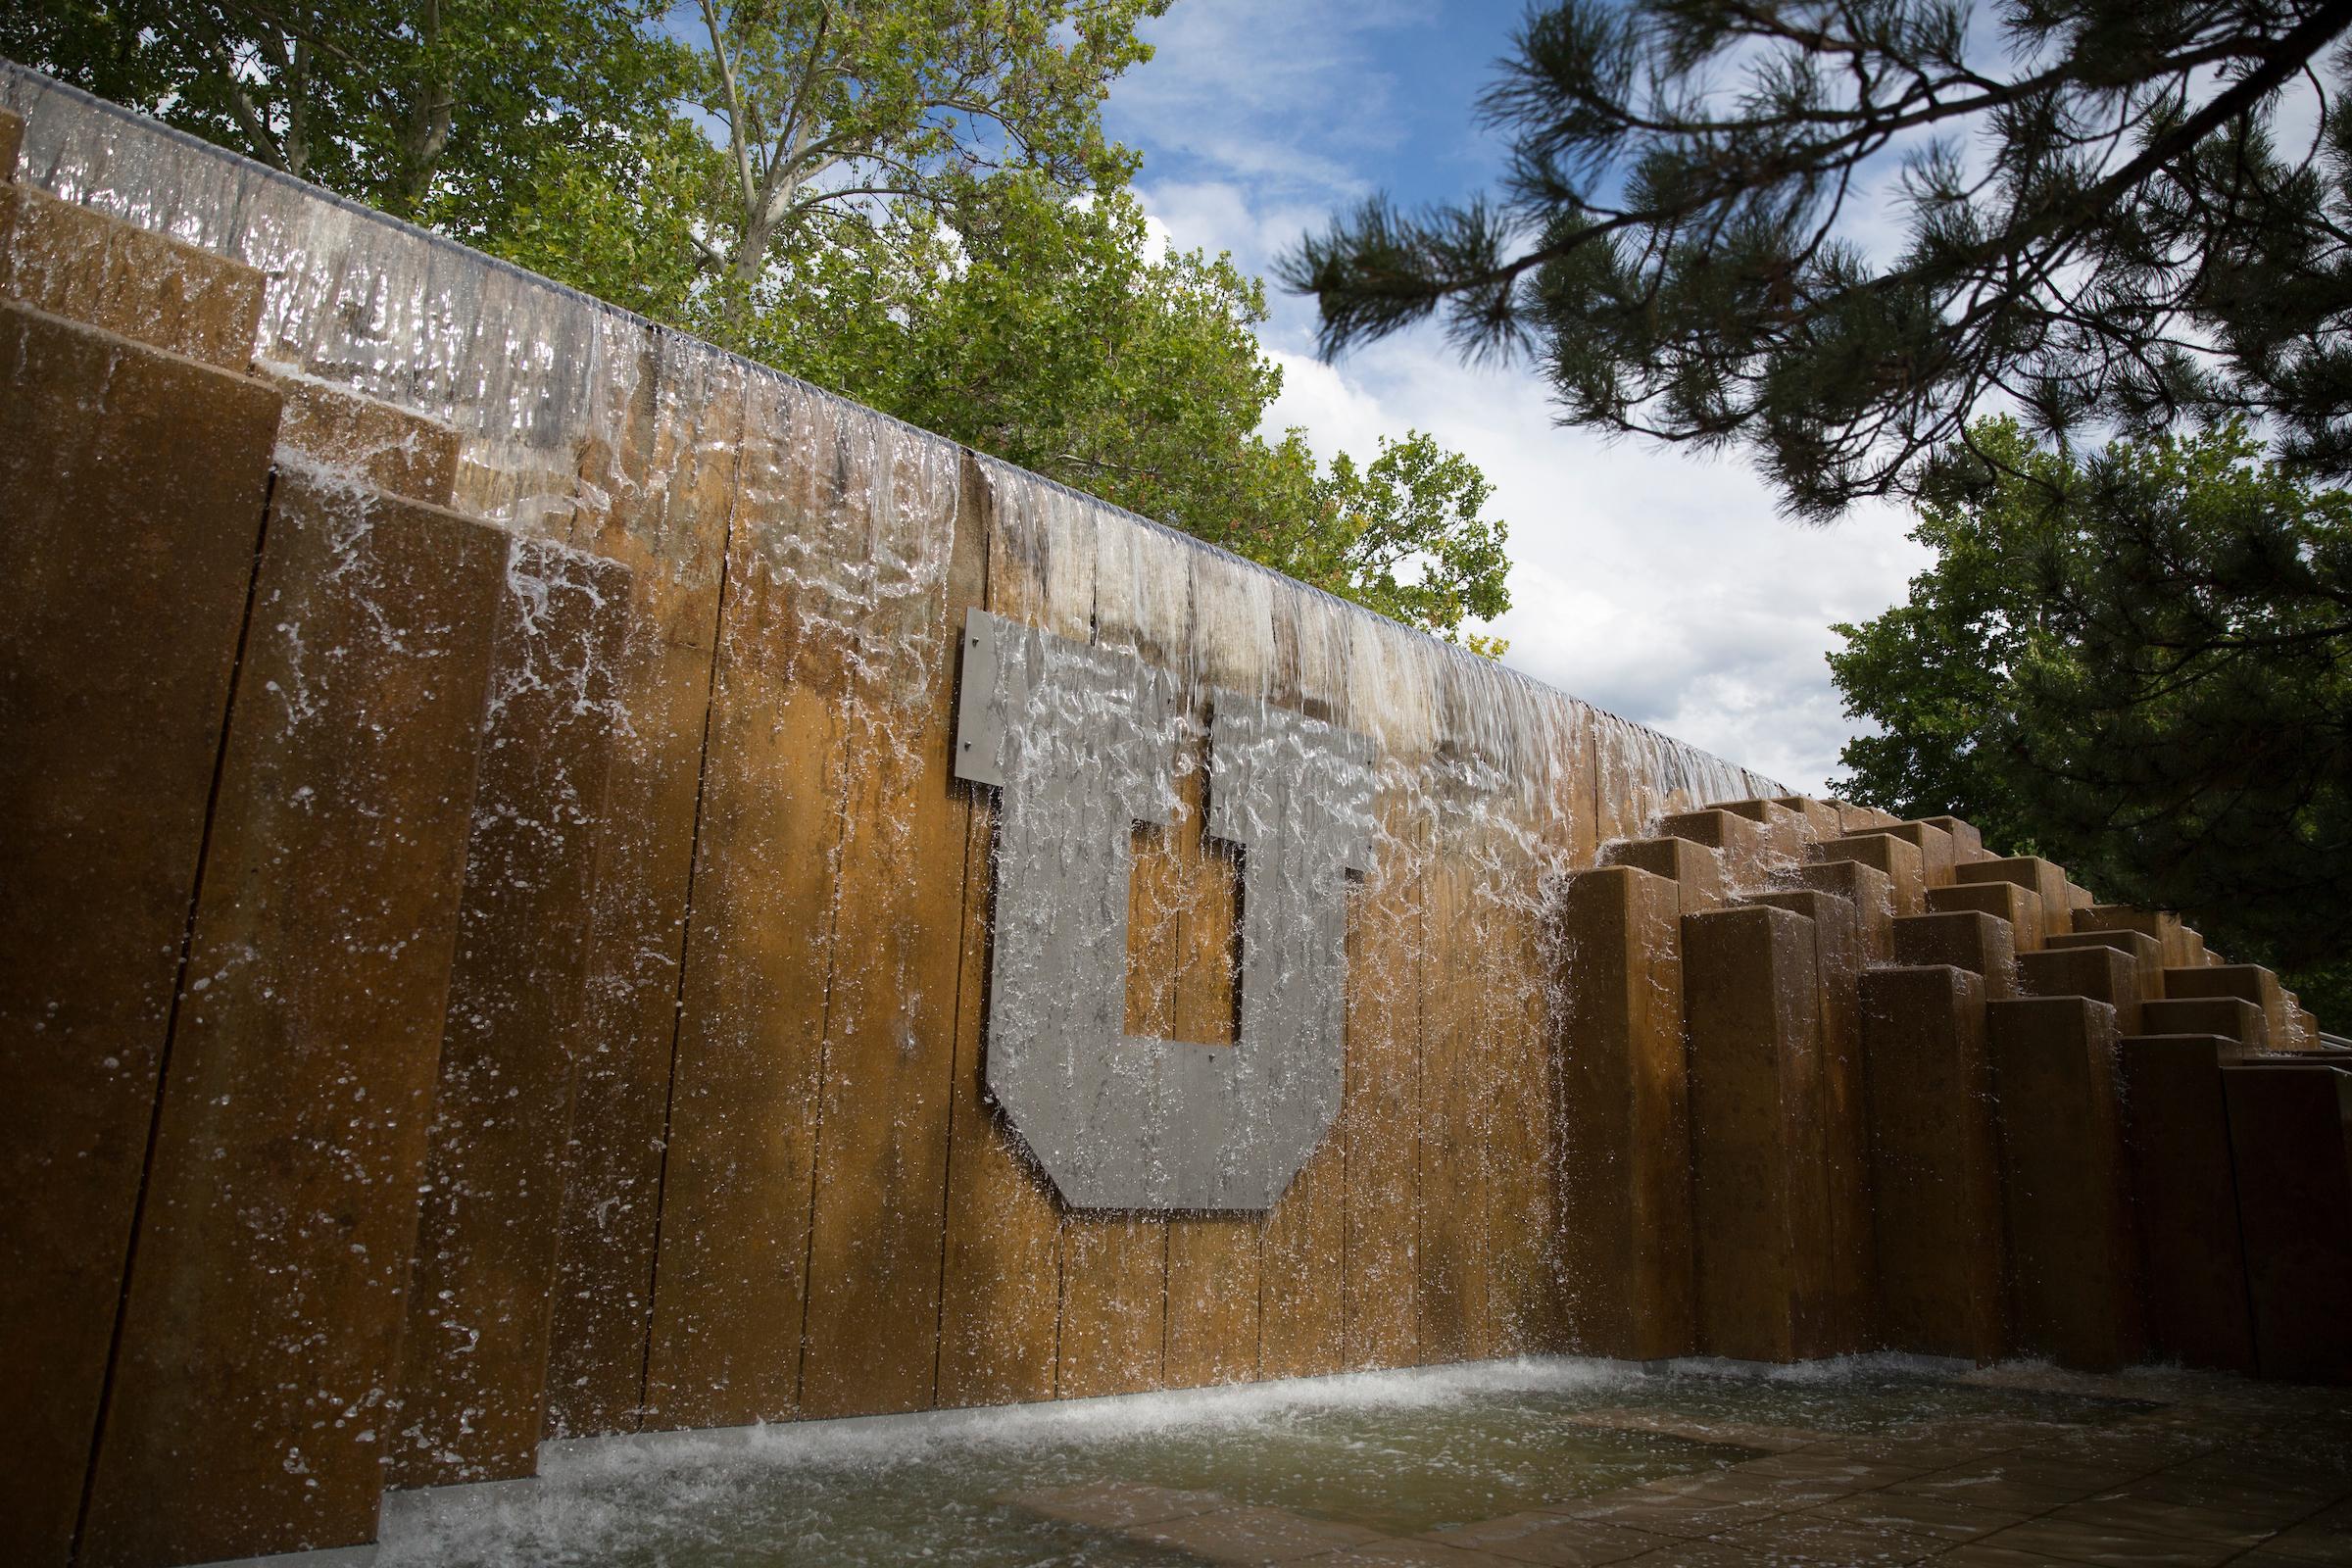 The University of Utah - BYU 2017-10-31 16:45